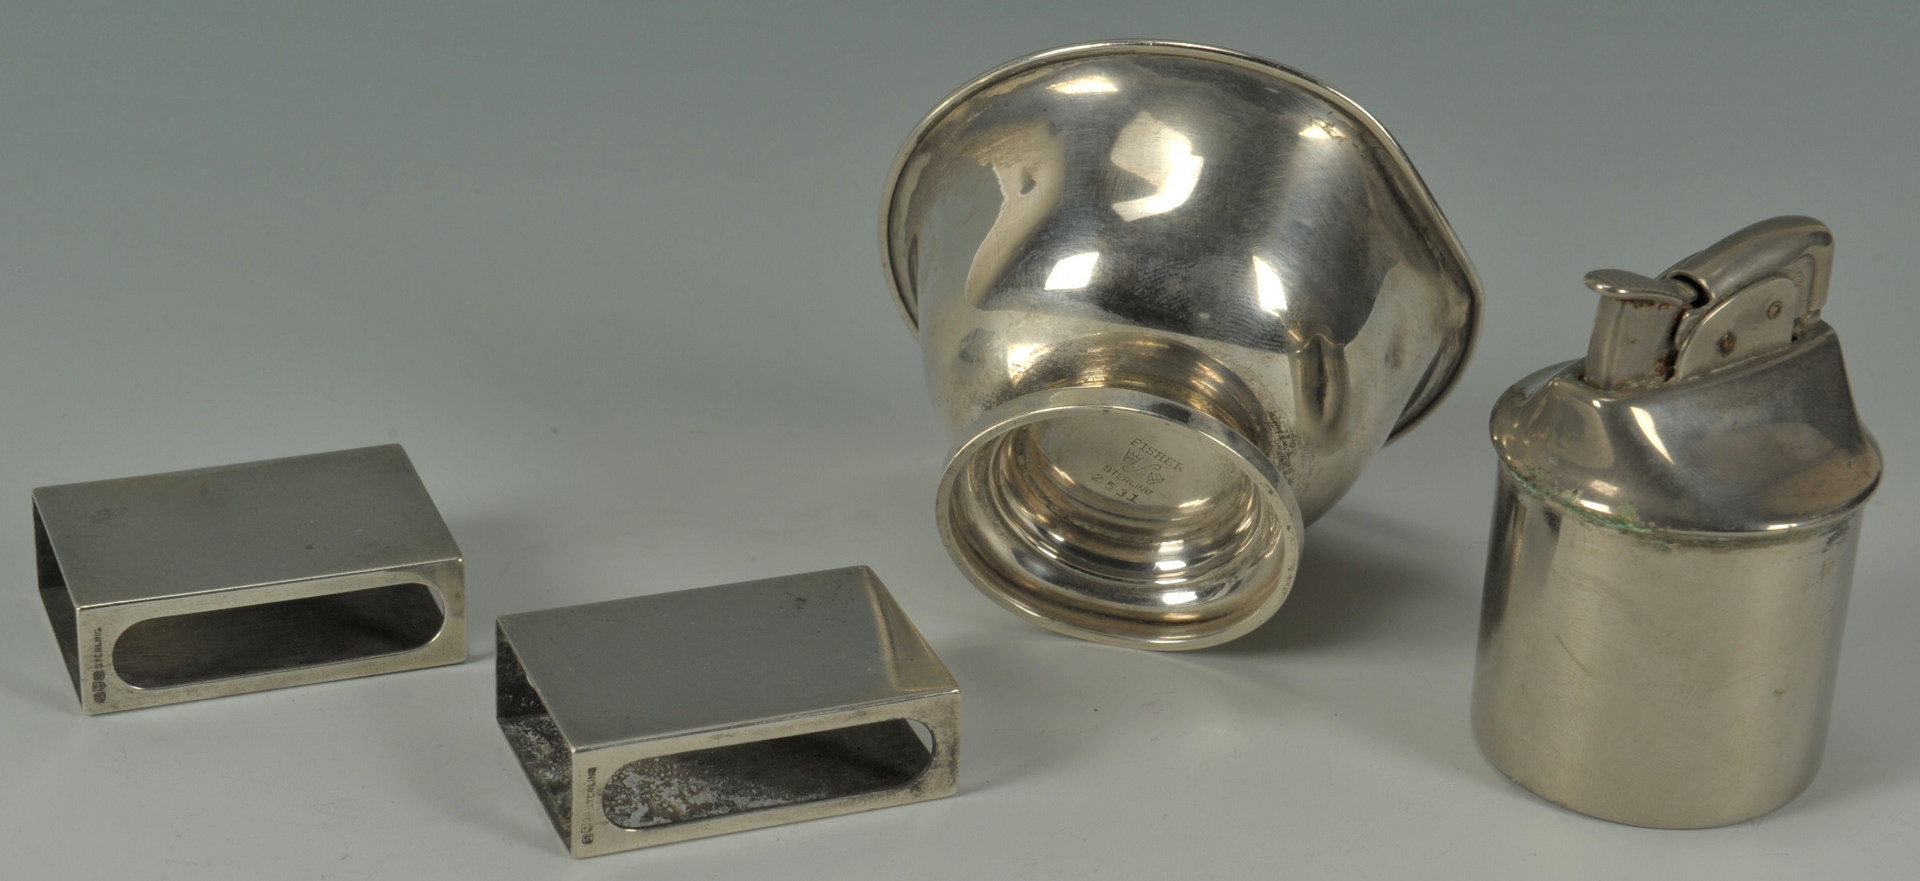 Lot 422: Group of silver hollowware, 9 pcs